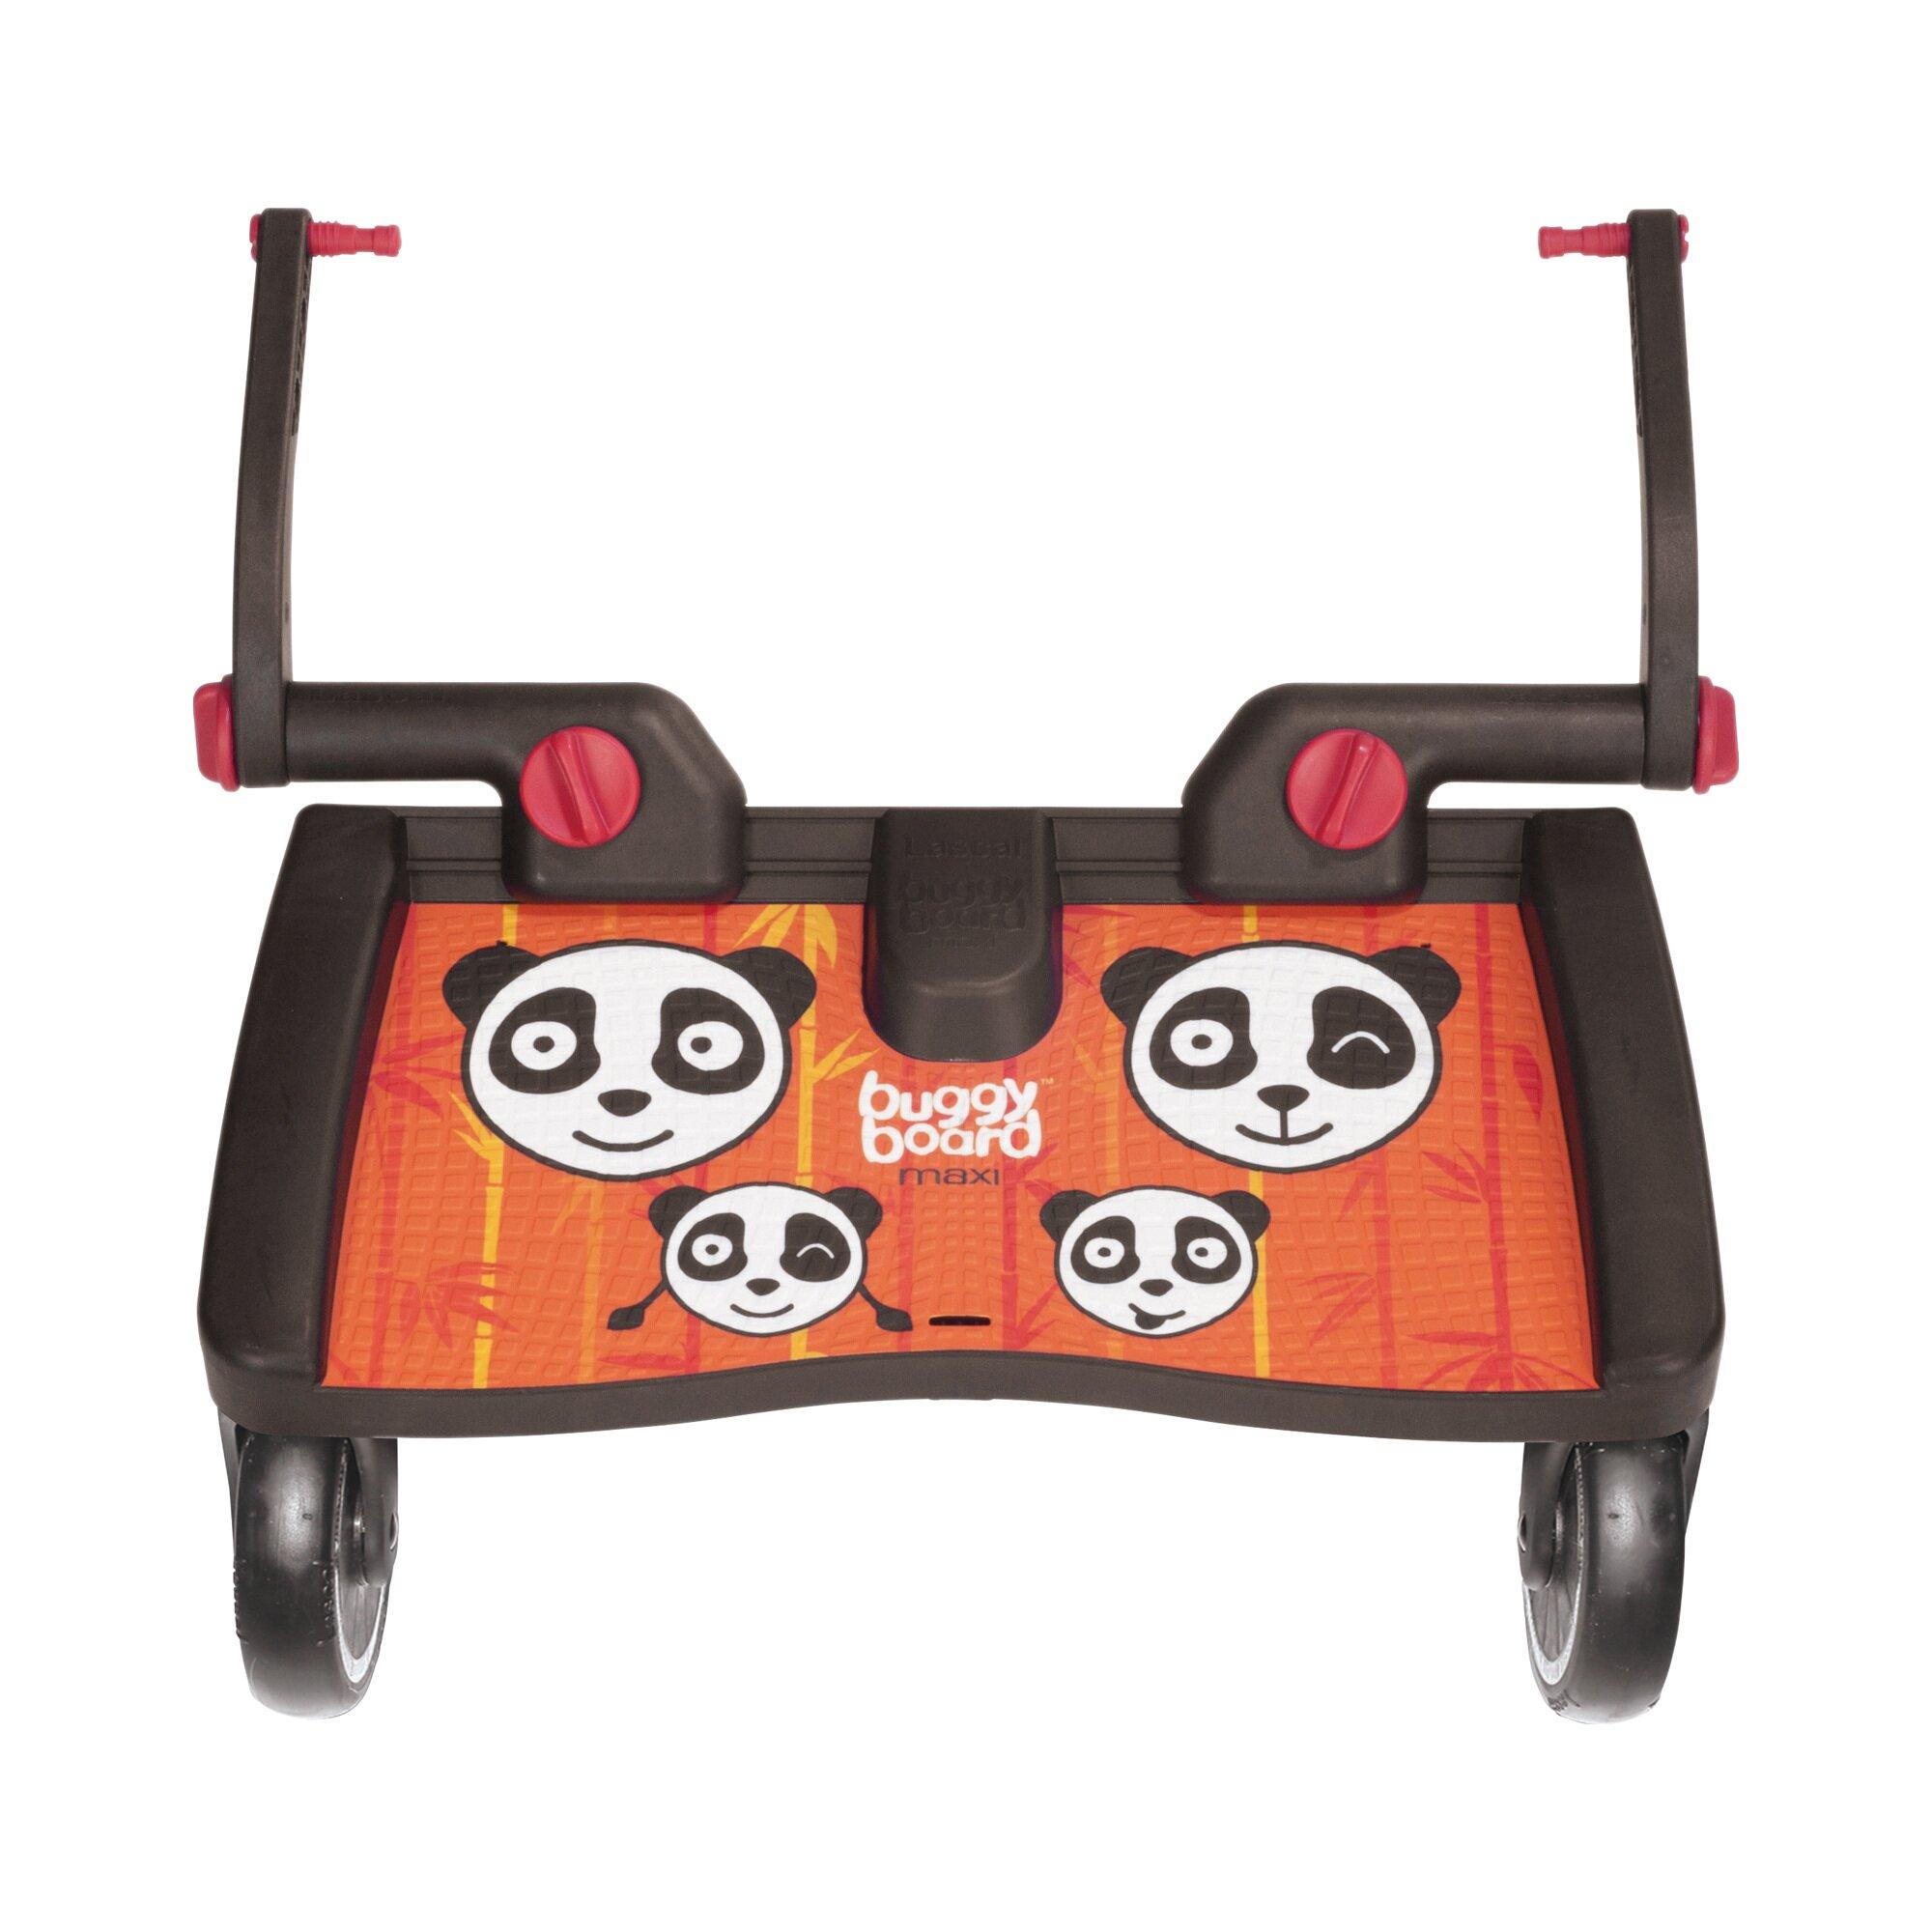 Lascal Buggy-Board Maxi für Kinderwagen, Kinderwagen Jogger, Buggy orange